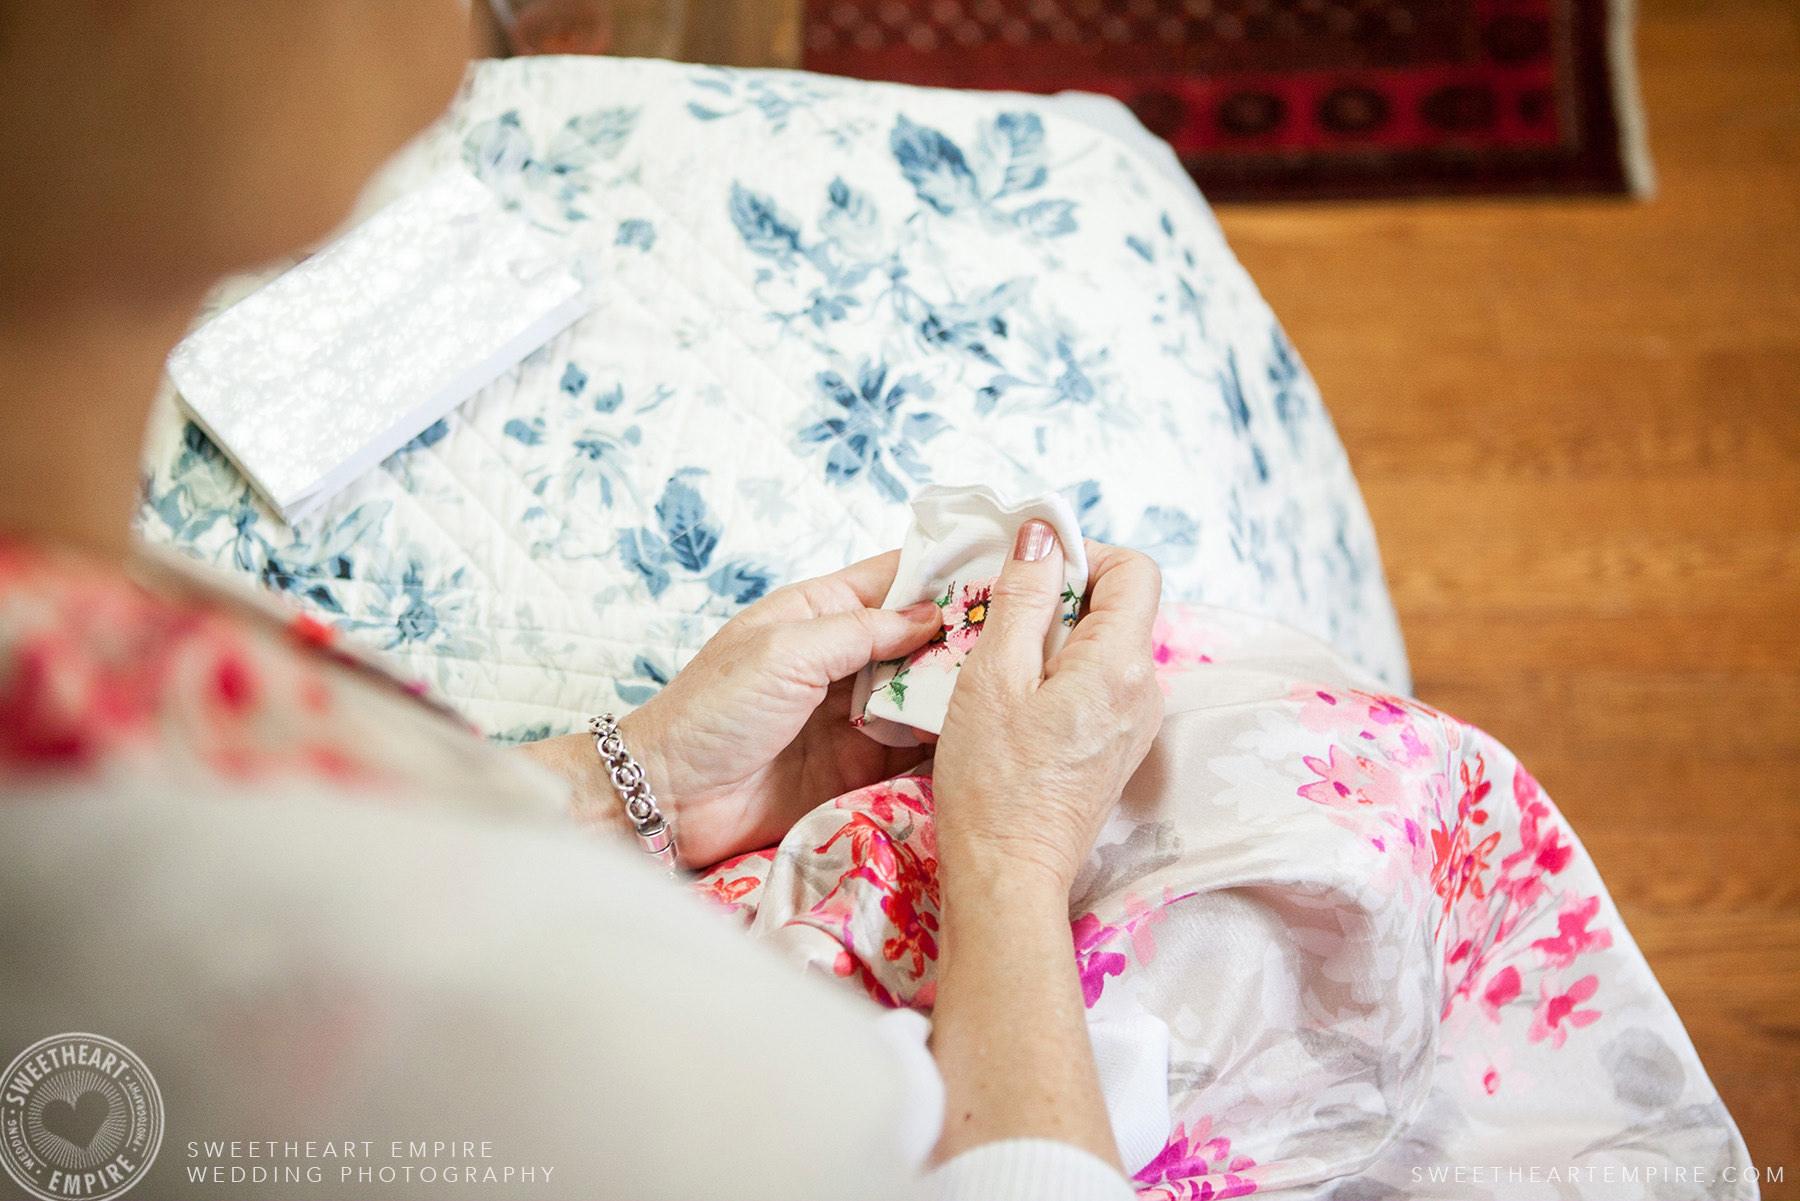 Holding a sentimental handkerchief, Toronto Island Elopement